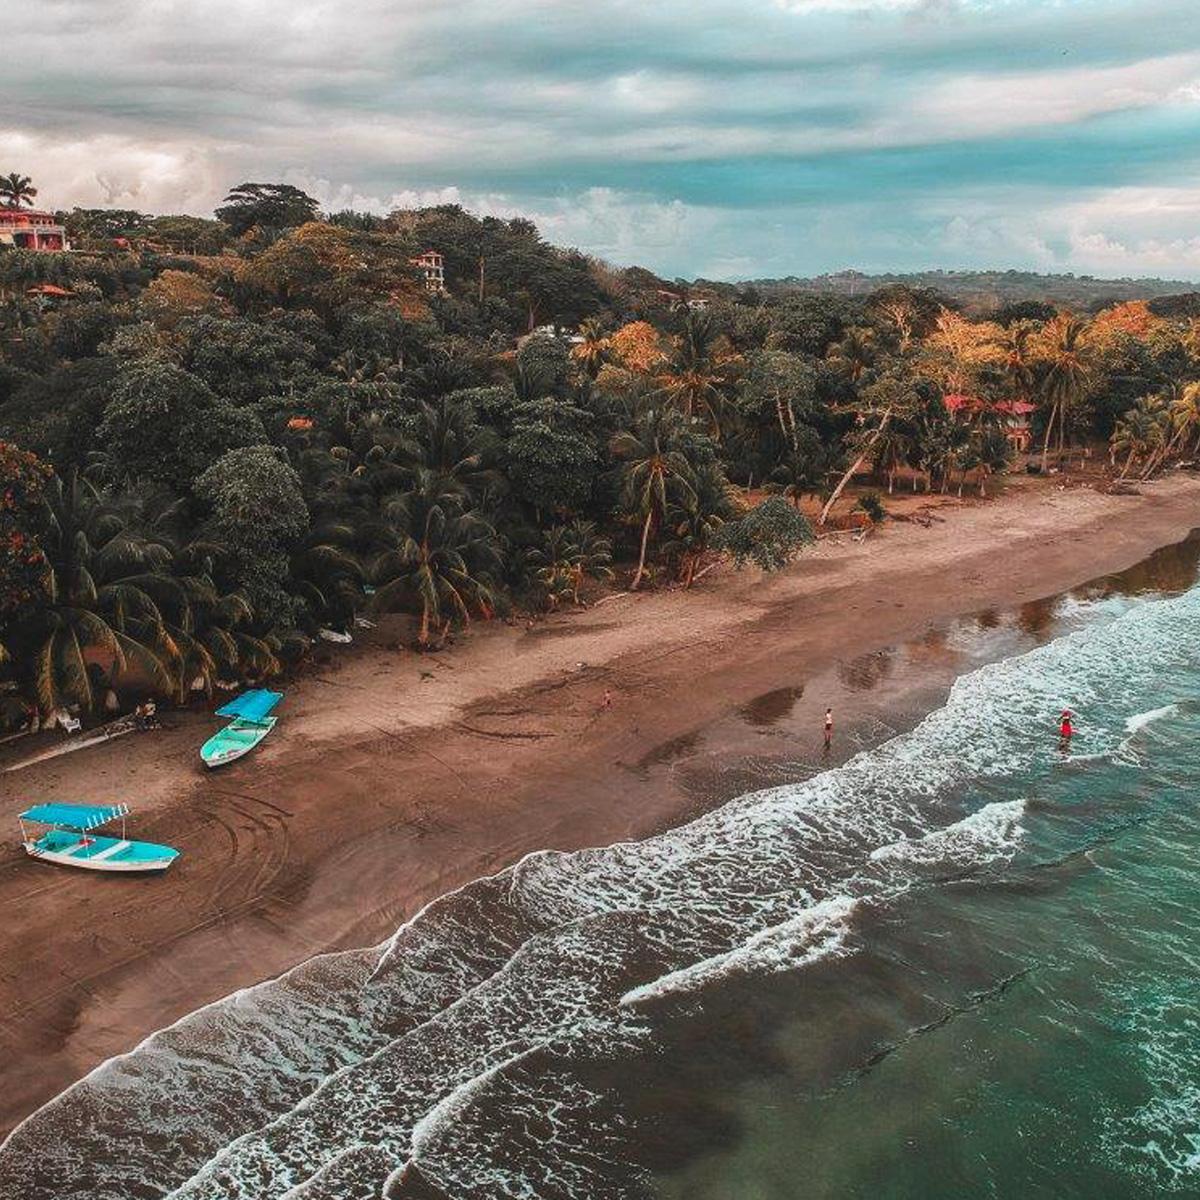 Costa Rica © Esteban Venegas | unsplash